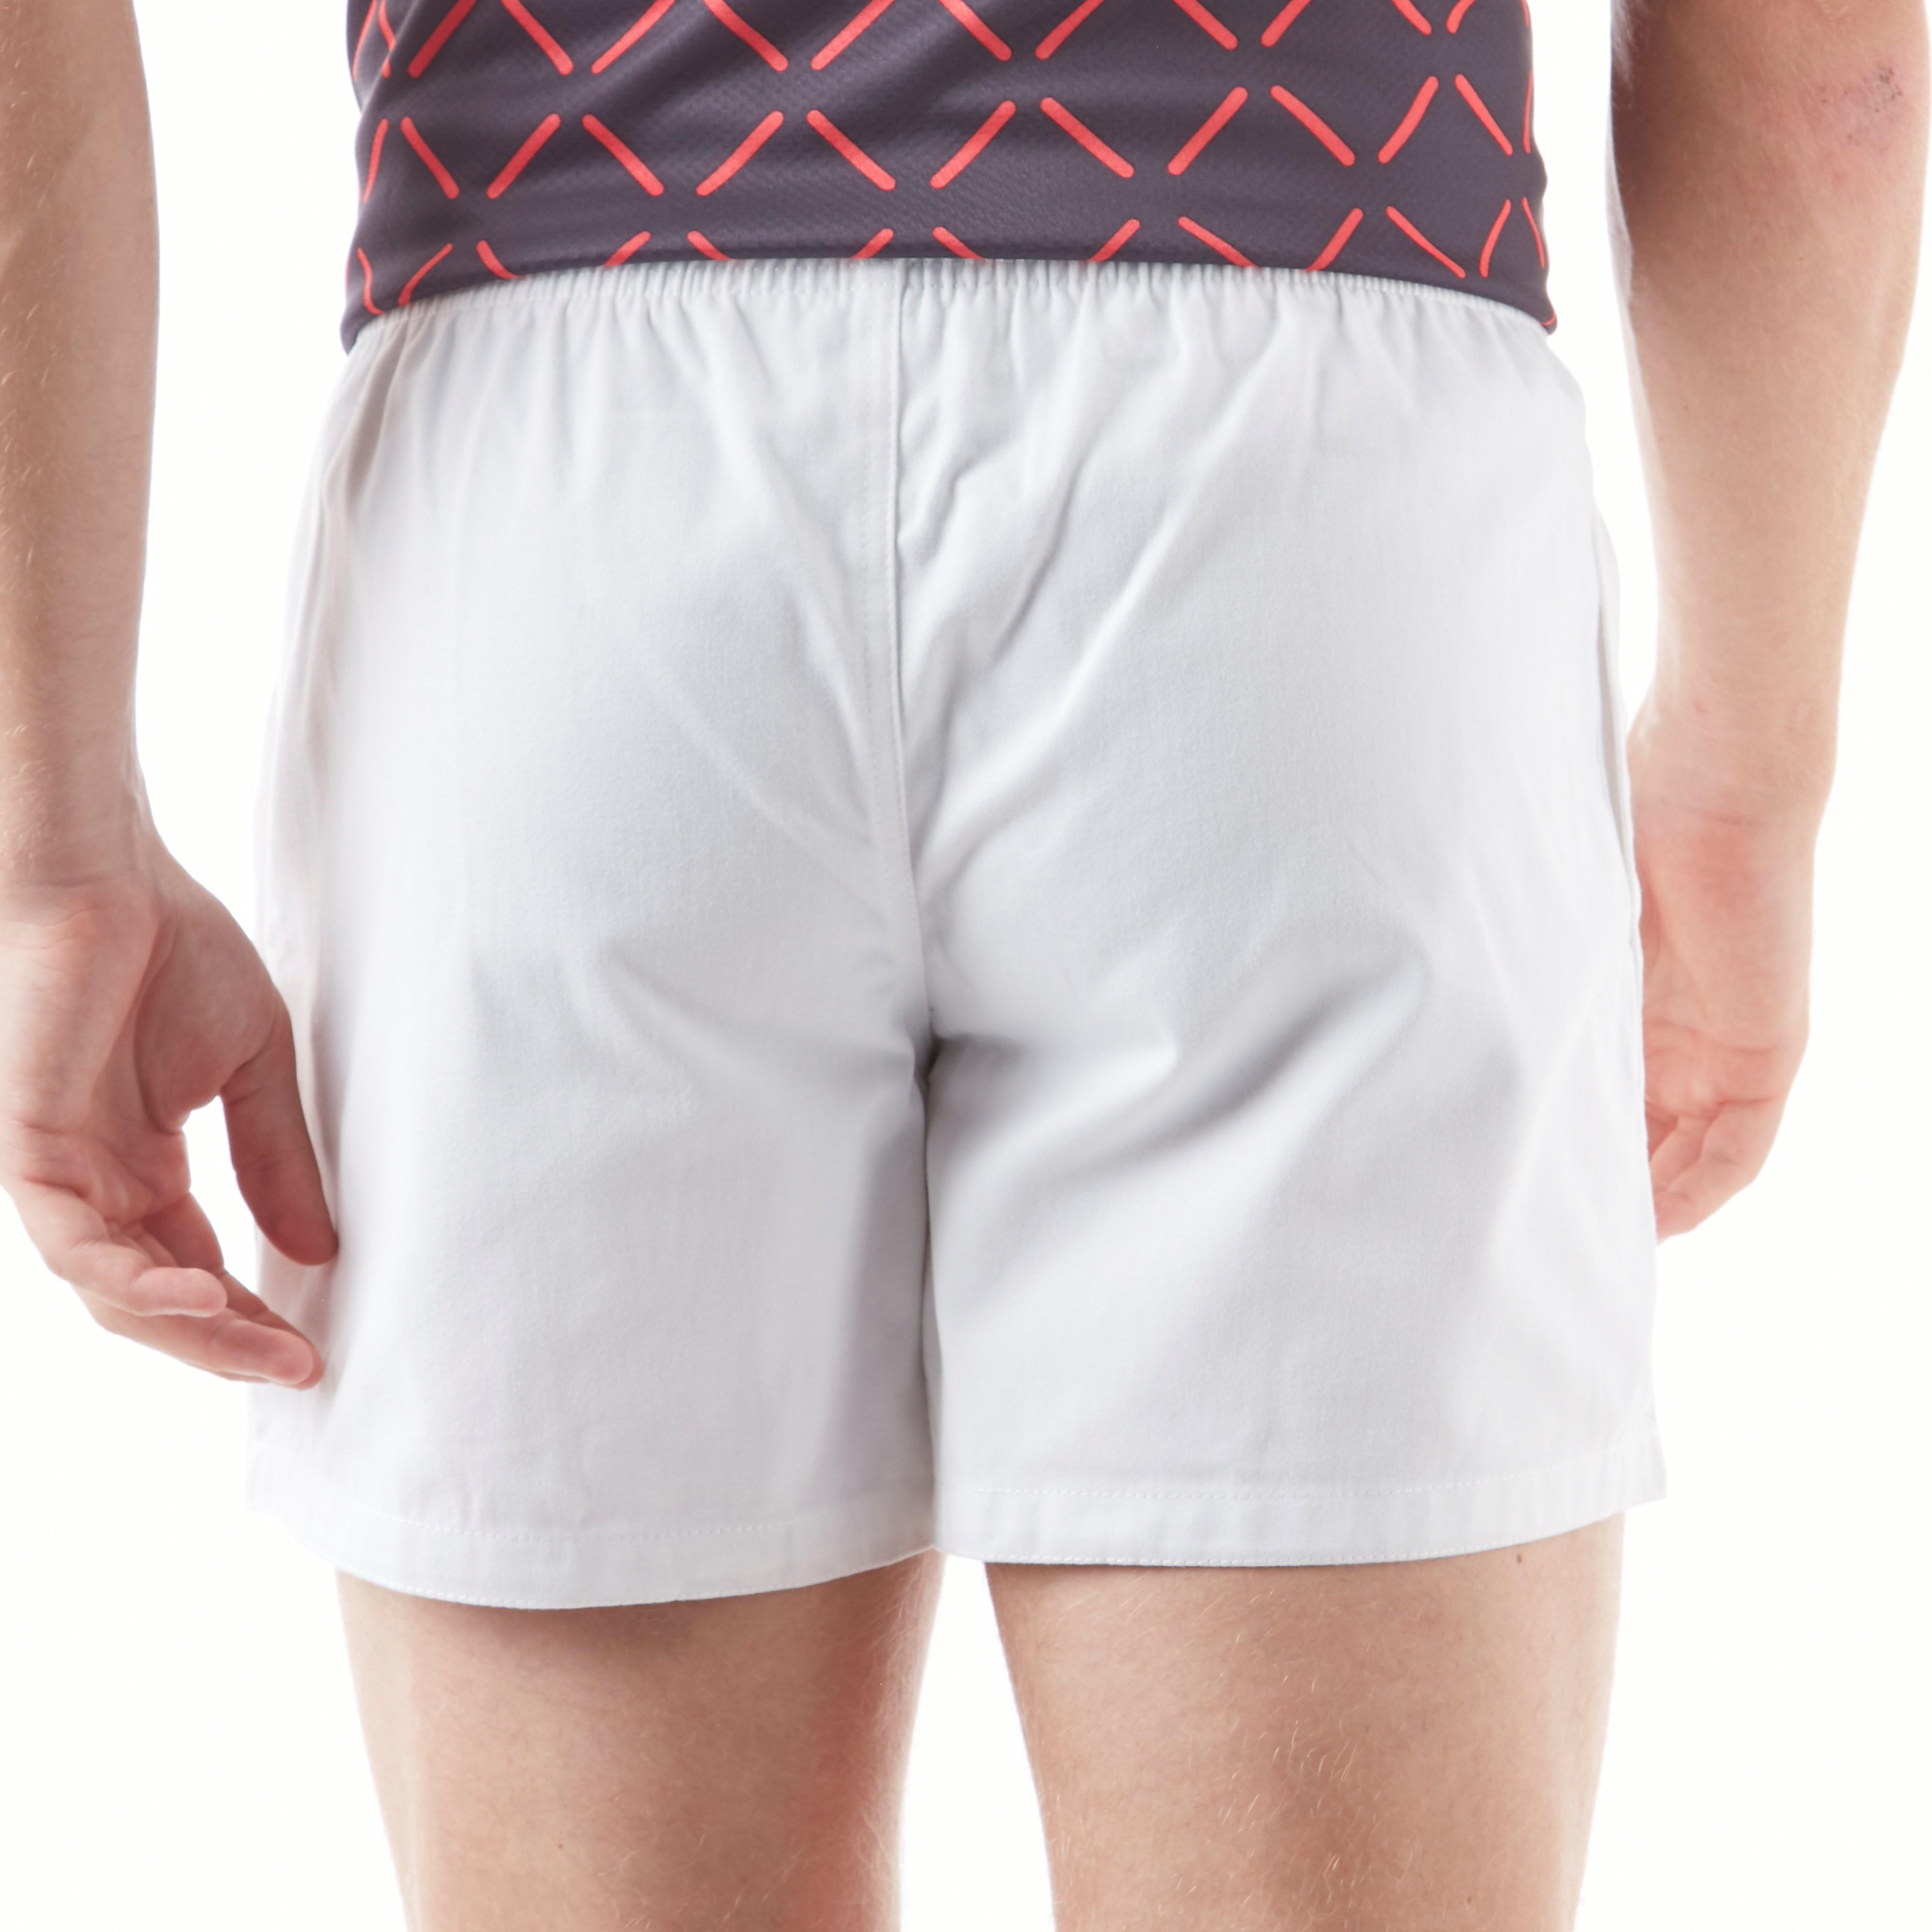 Gilbert Kiwi Pro Rugby Shorts